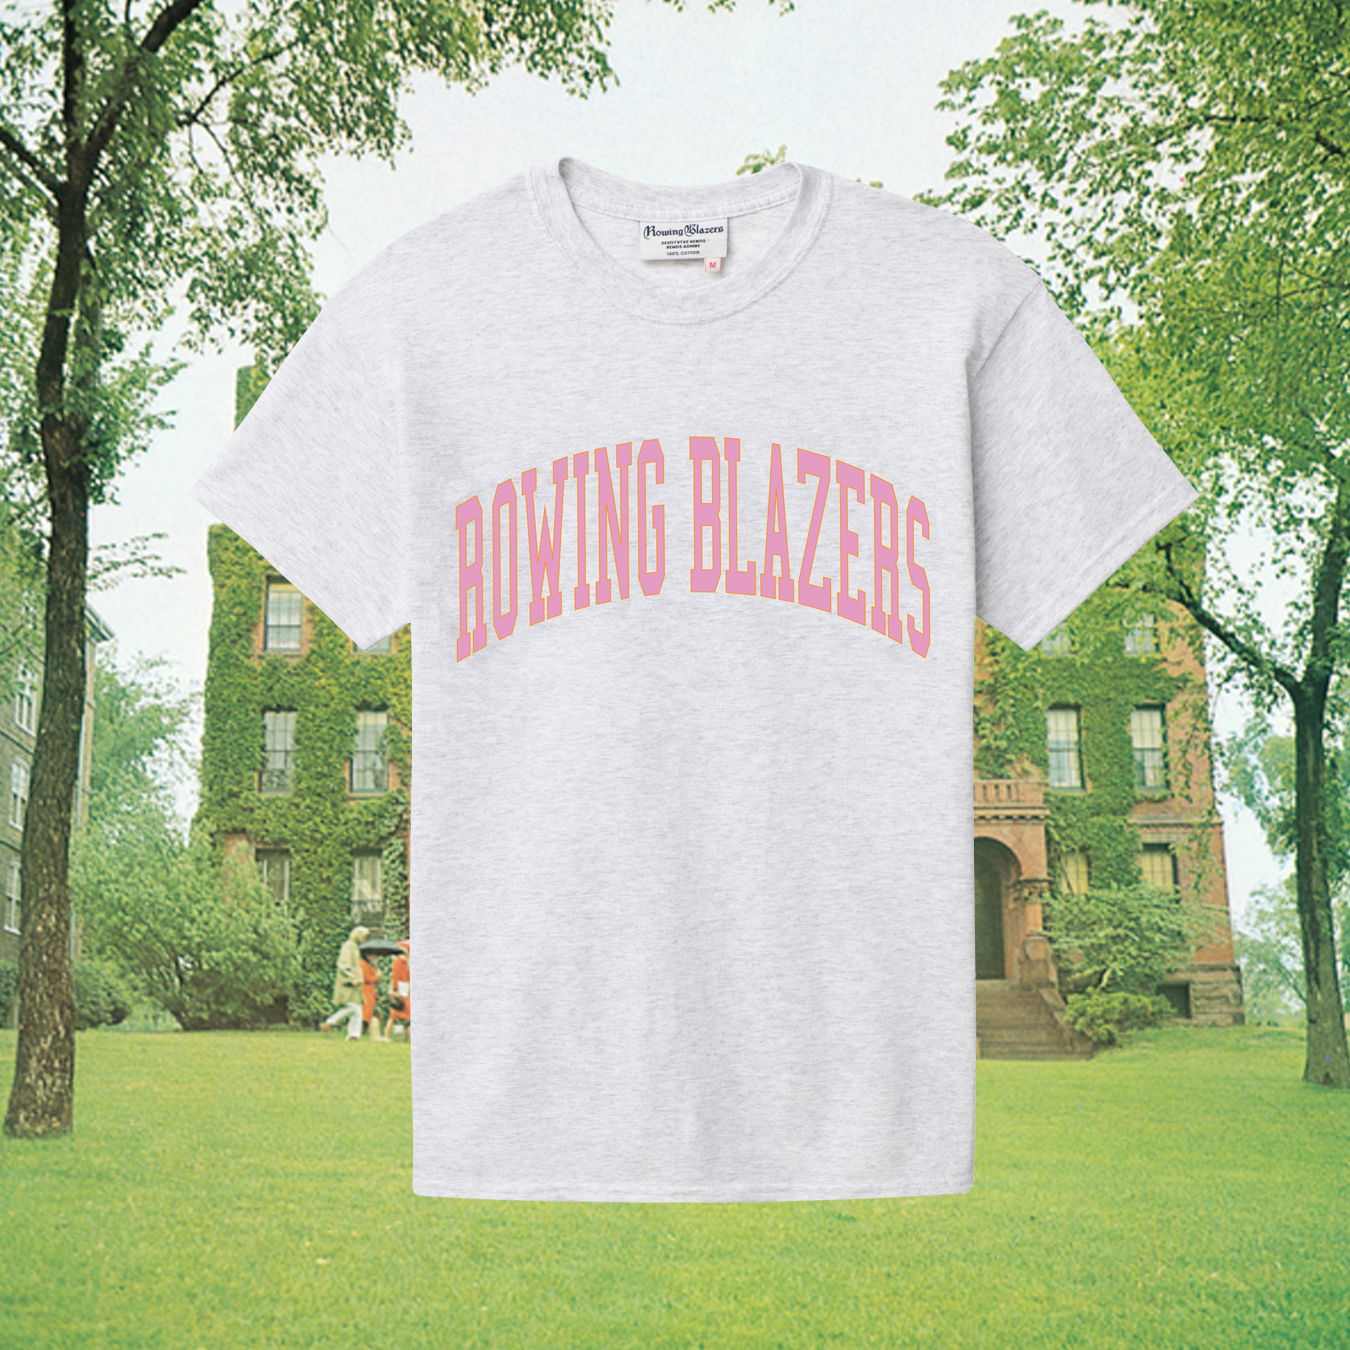 Rowing Blazers: Shop New Collegiate Tee Colors | Milled